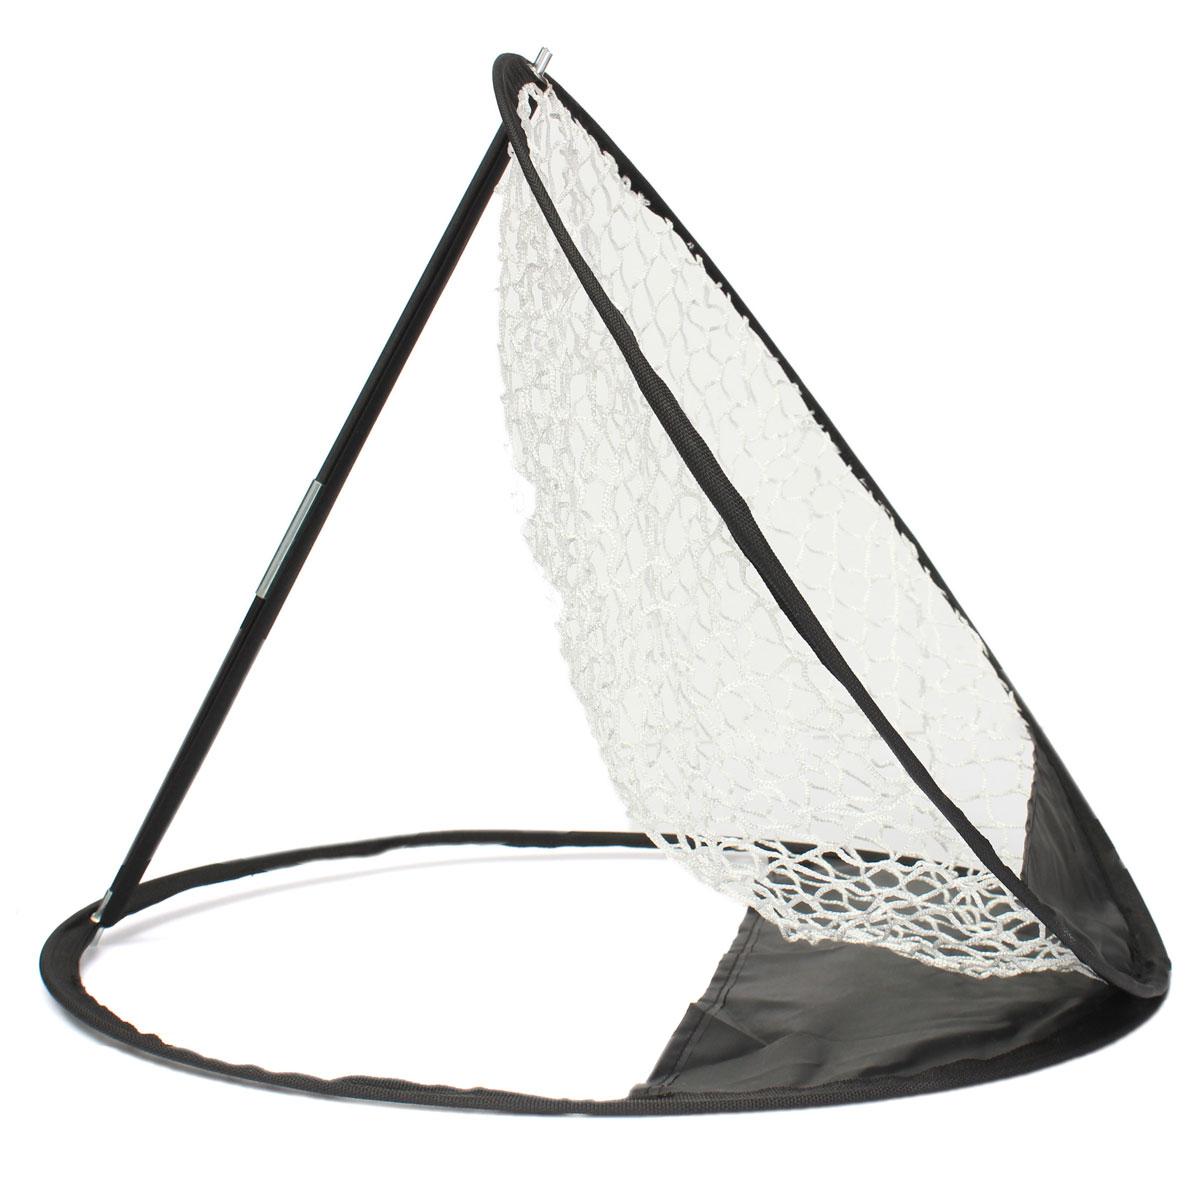 Training Chipping Net Target Net Outdoor Indoor Aid (Intl) Lazada PH #746457